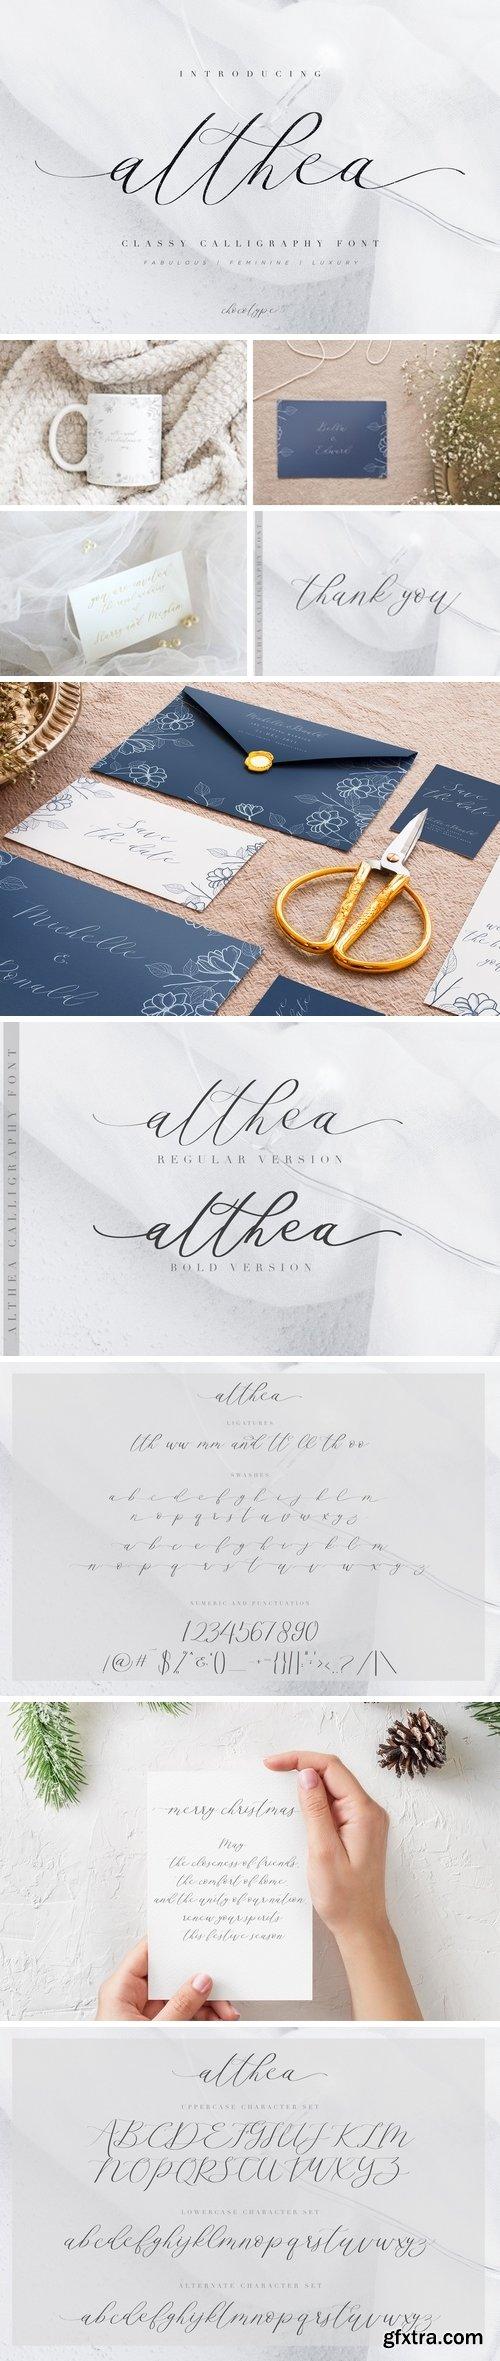 CM - Althea 3290083